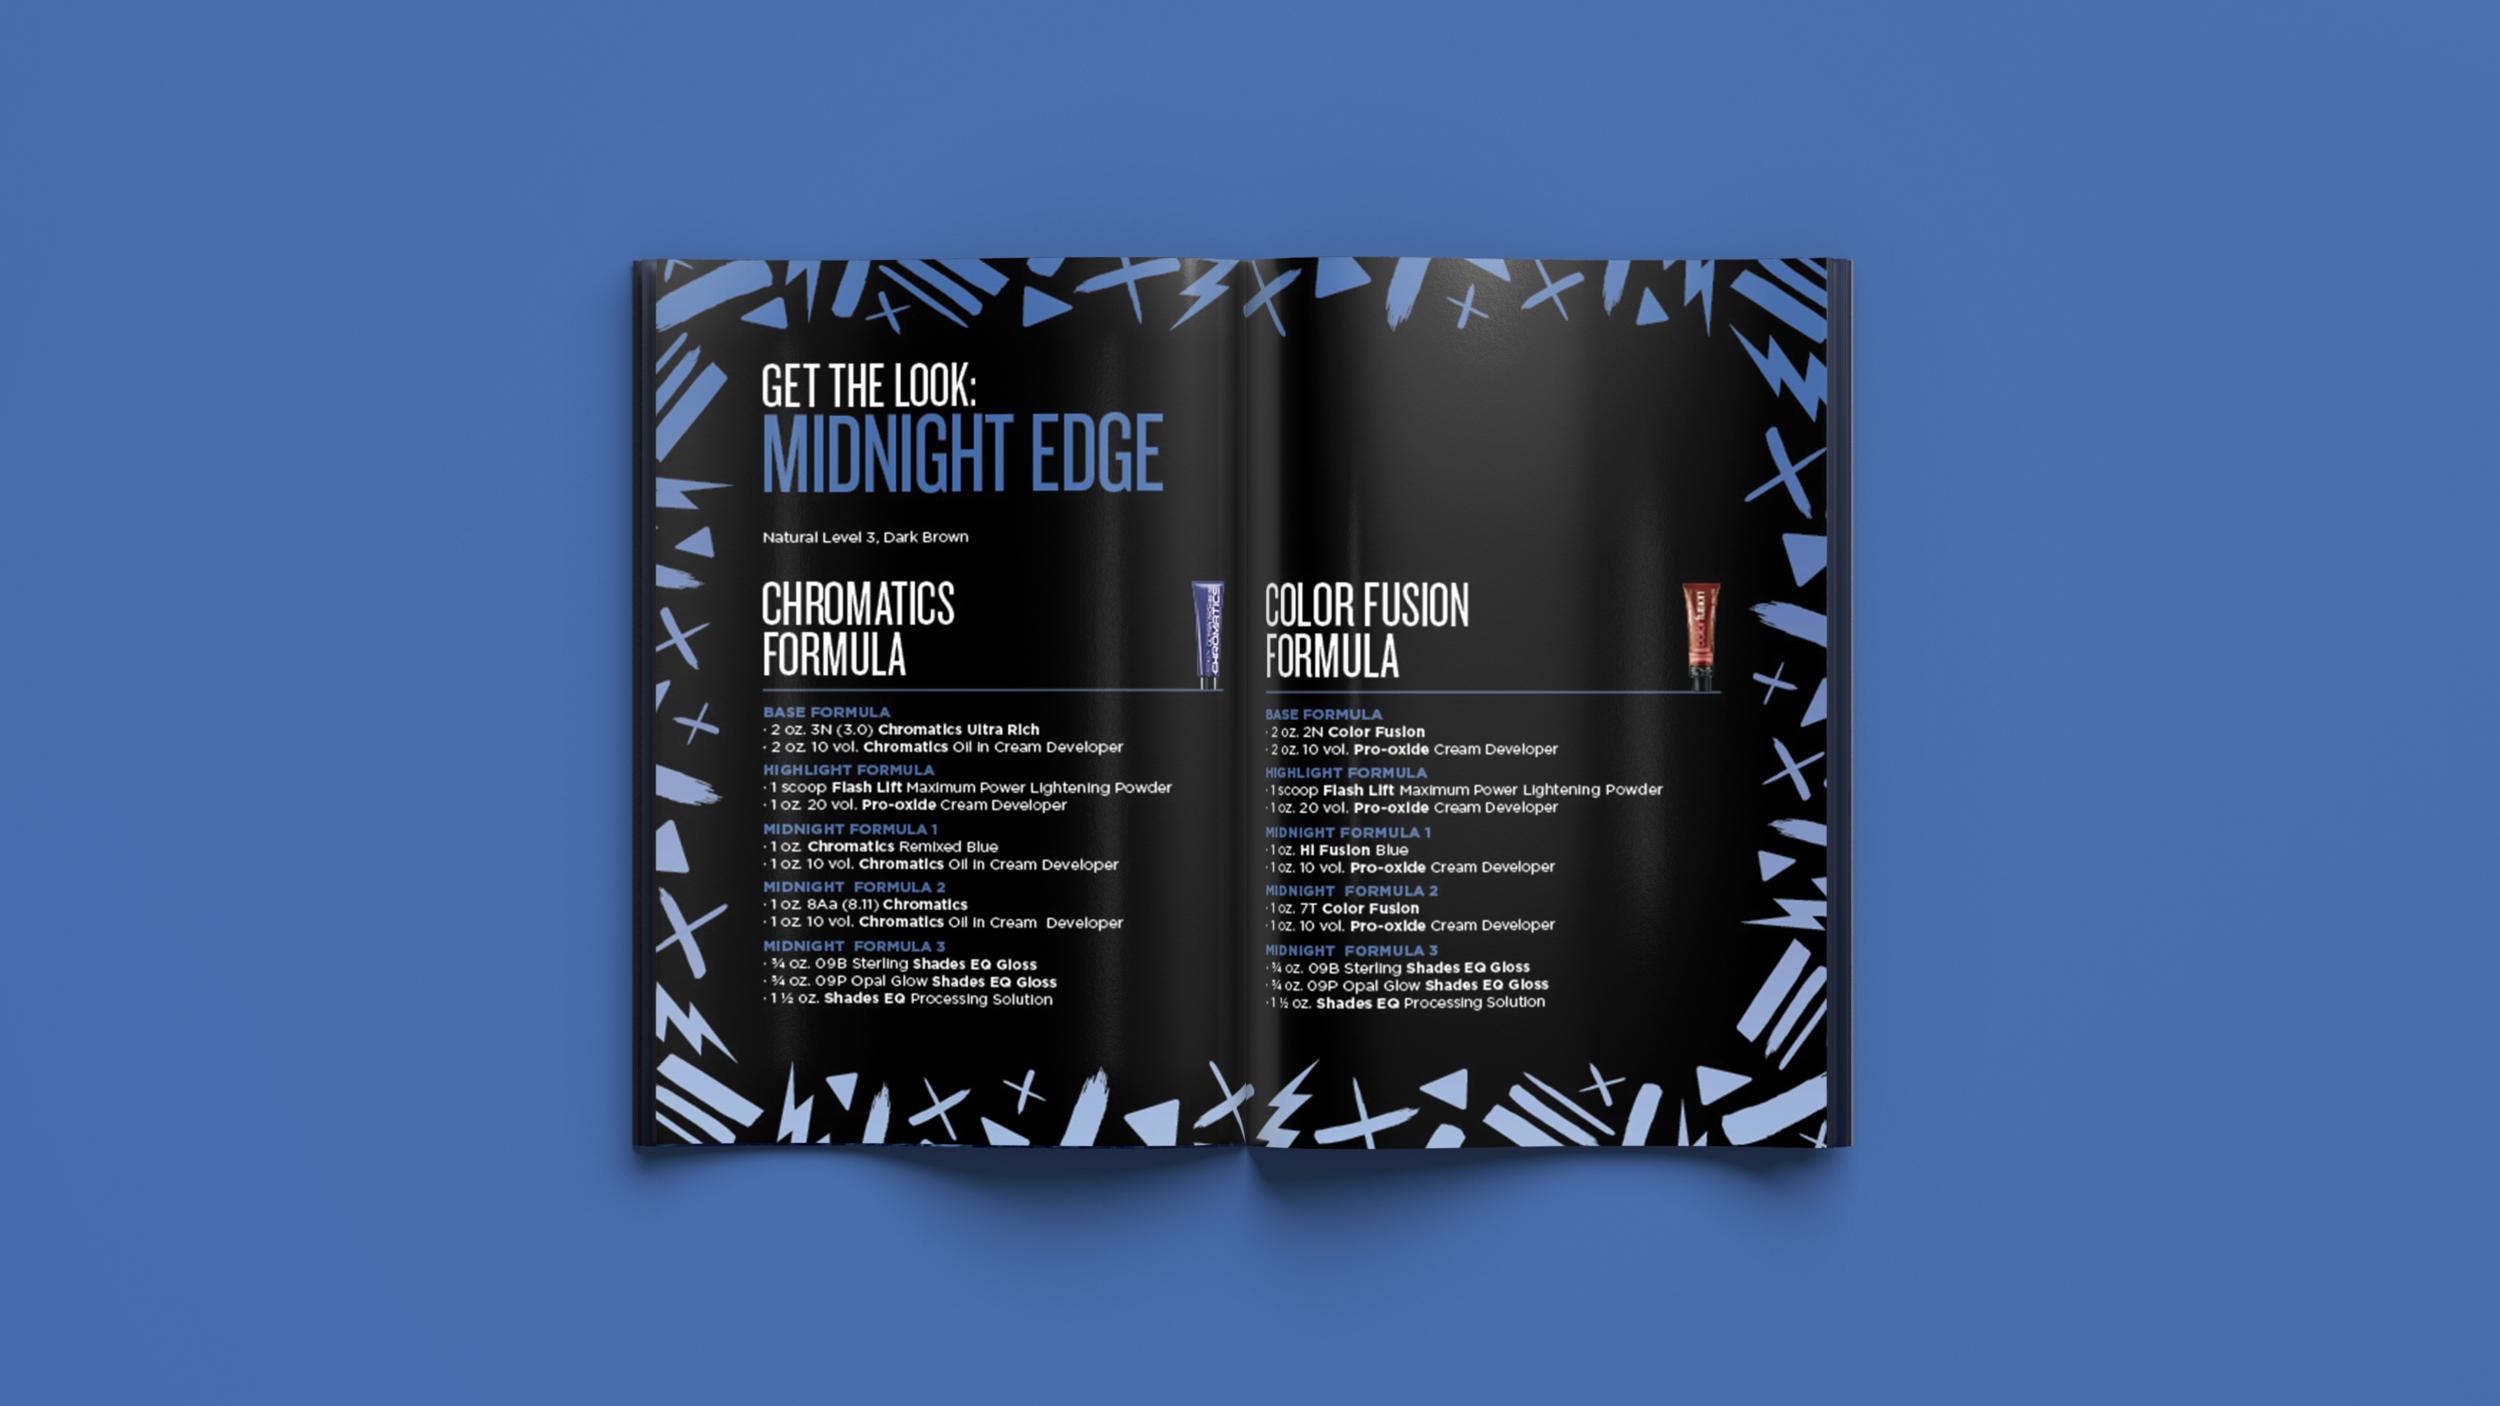 MidnightEdge_TechGuide_Spread2.png